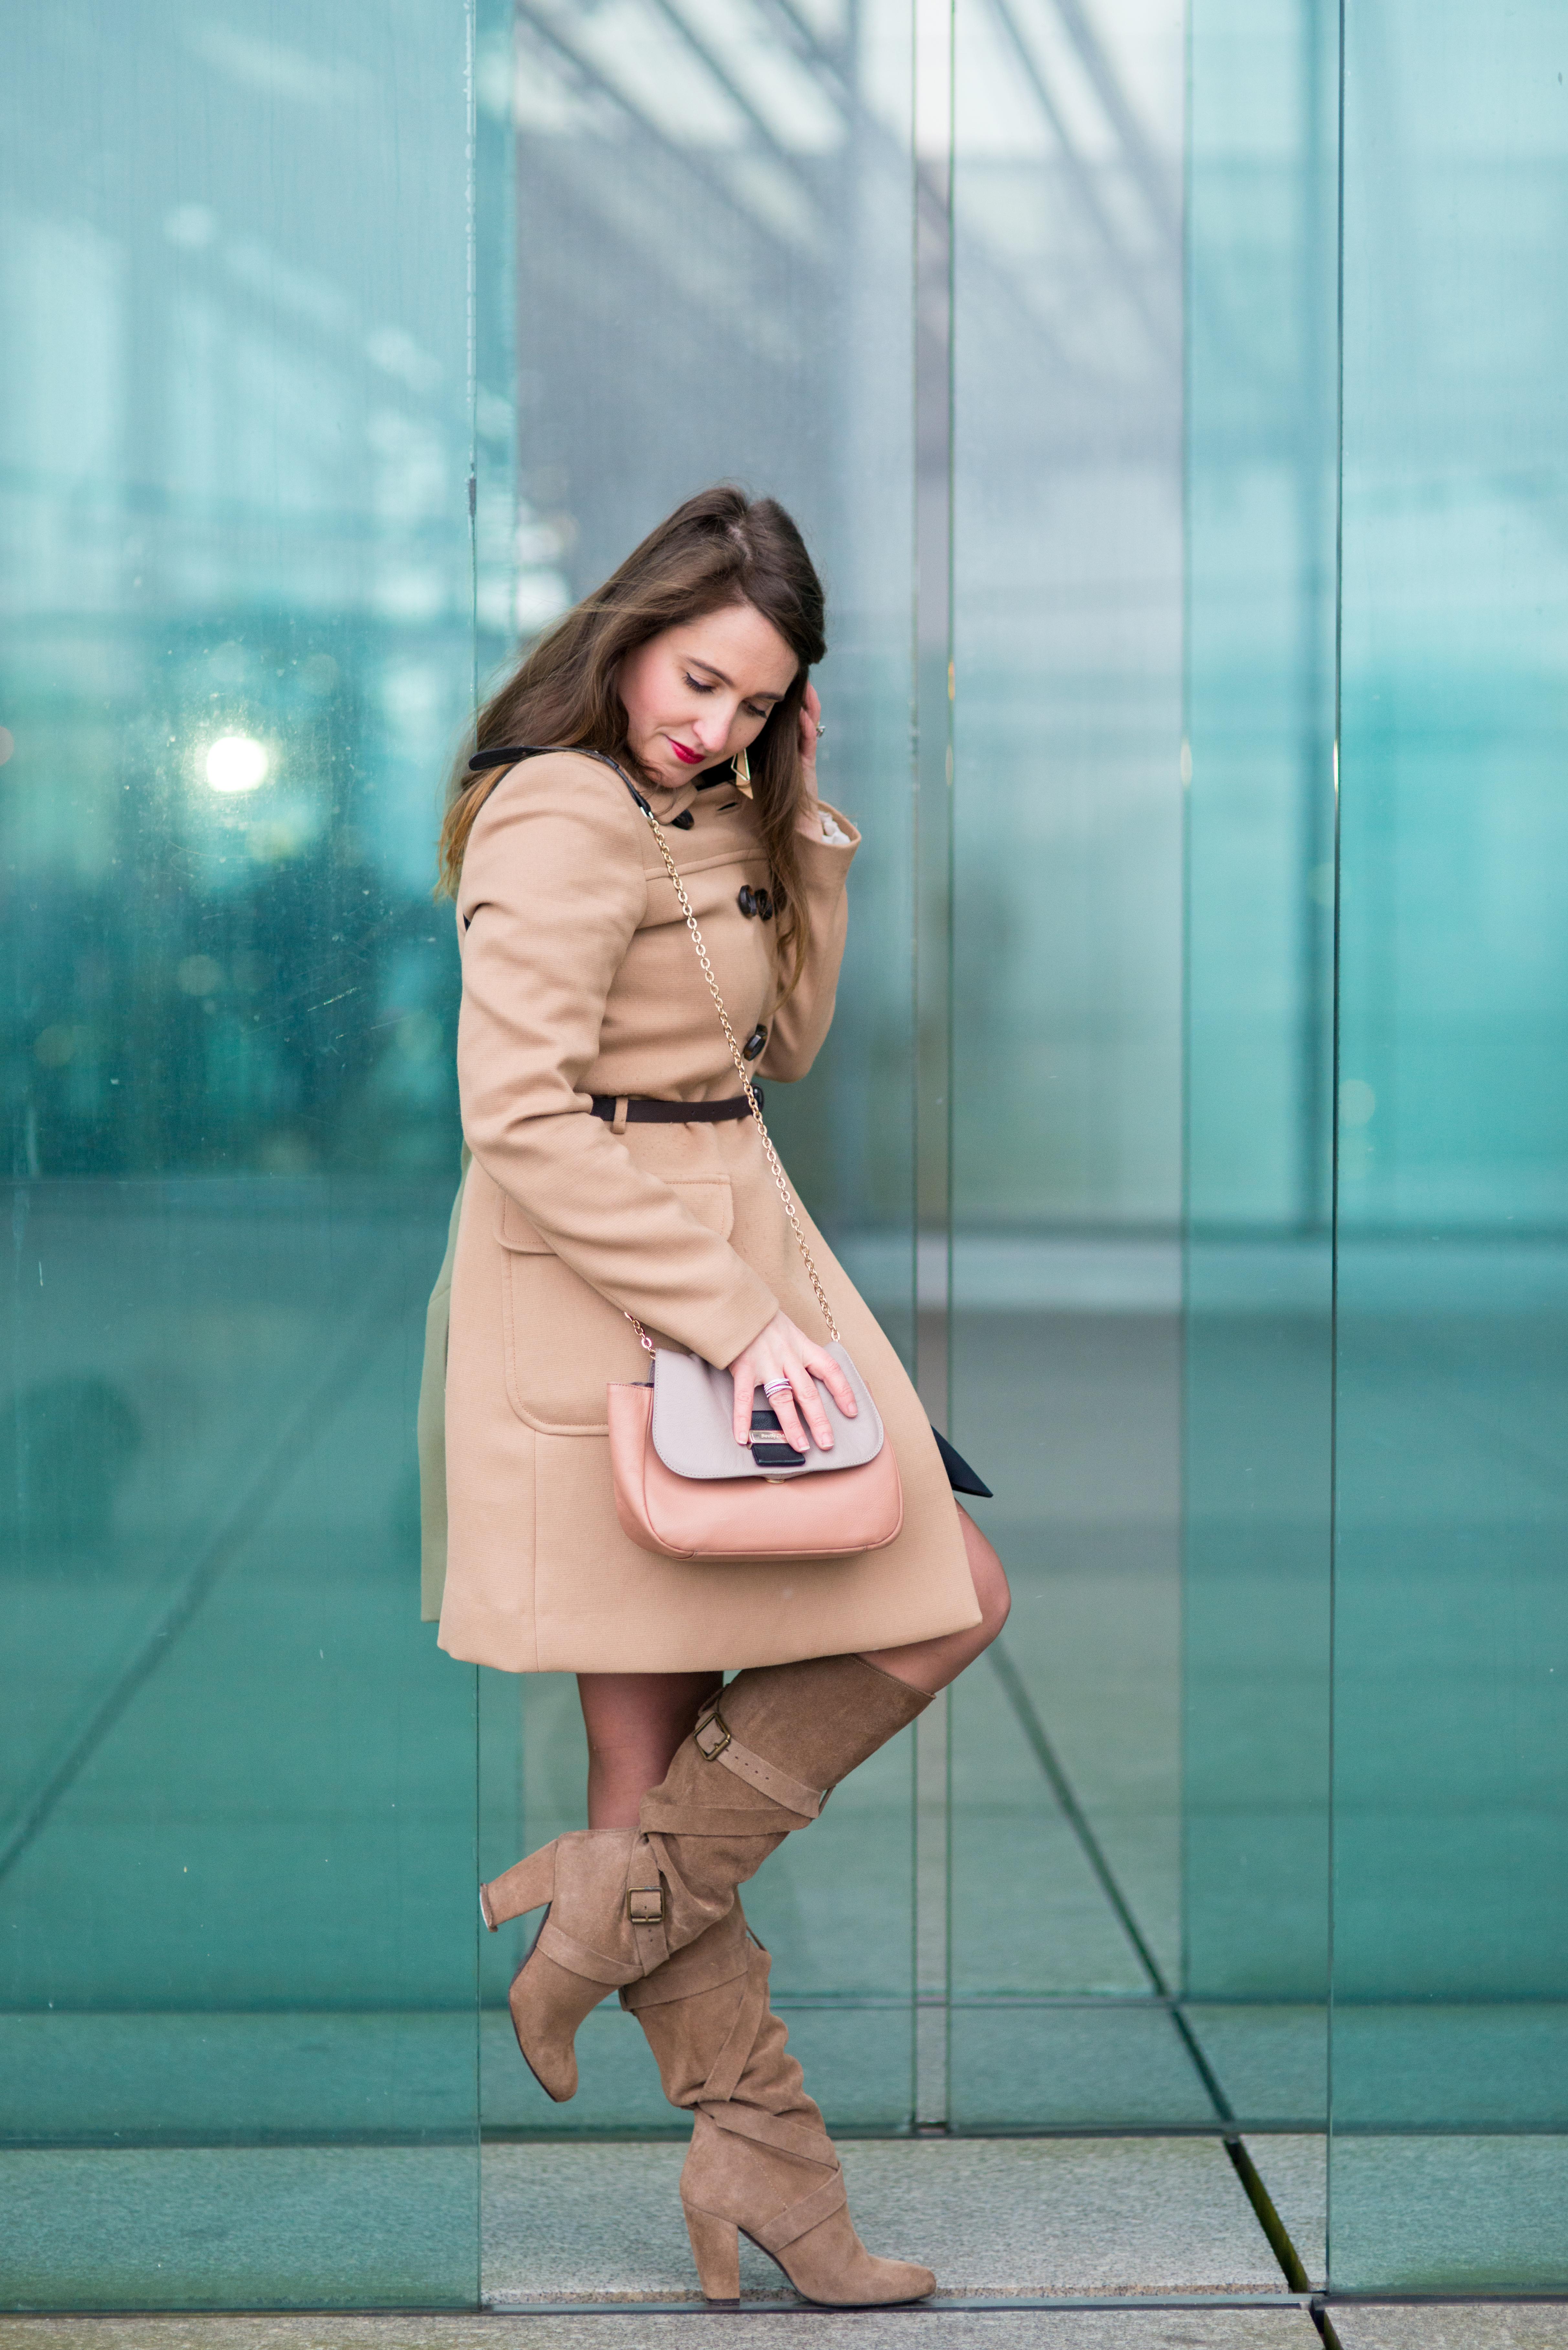 style-sophistique-modele-grandearche-ladefense-paris-fashionblogger-influencer-blouse-zara-seralynepointcom-ump_6678